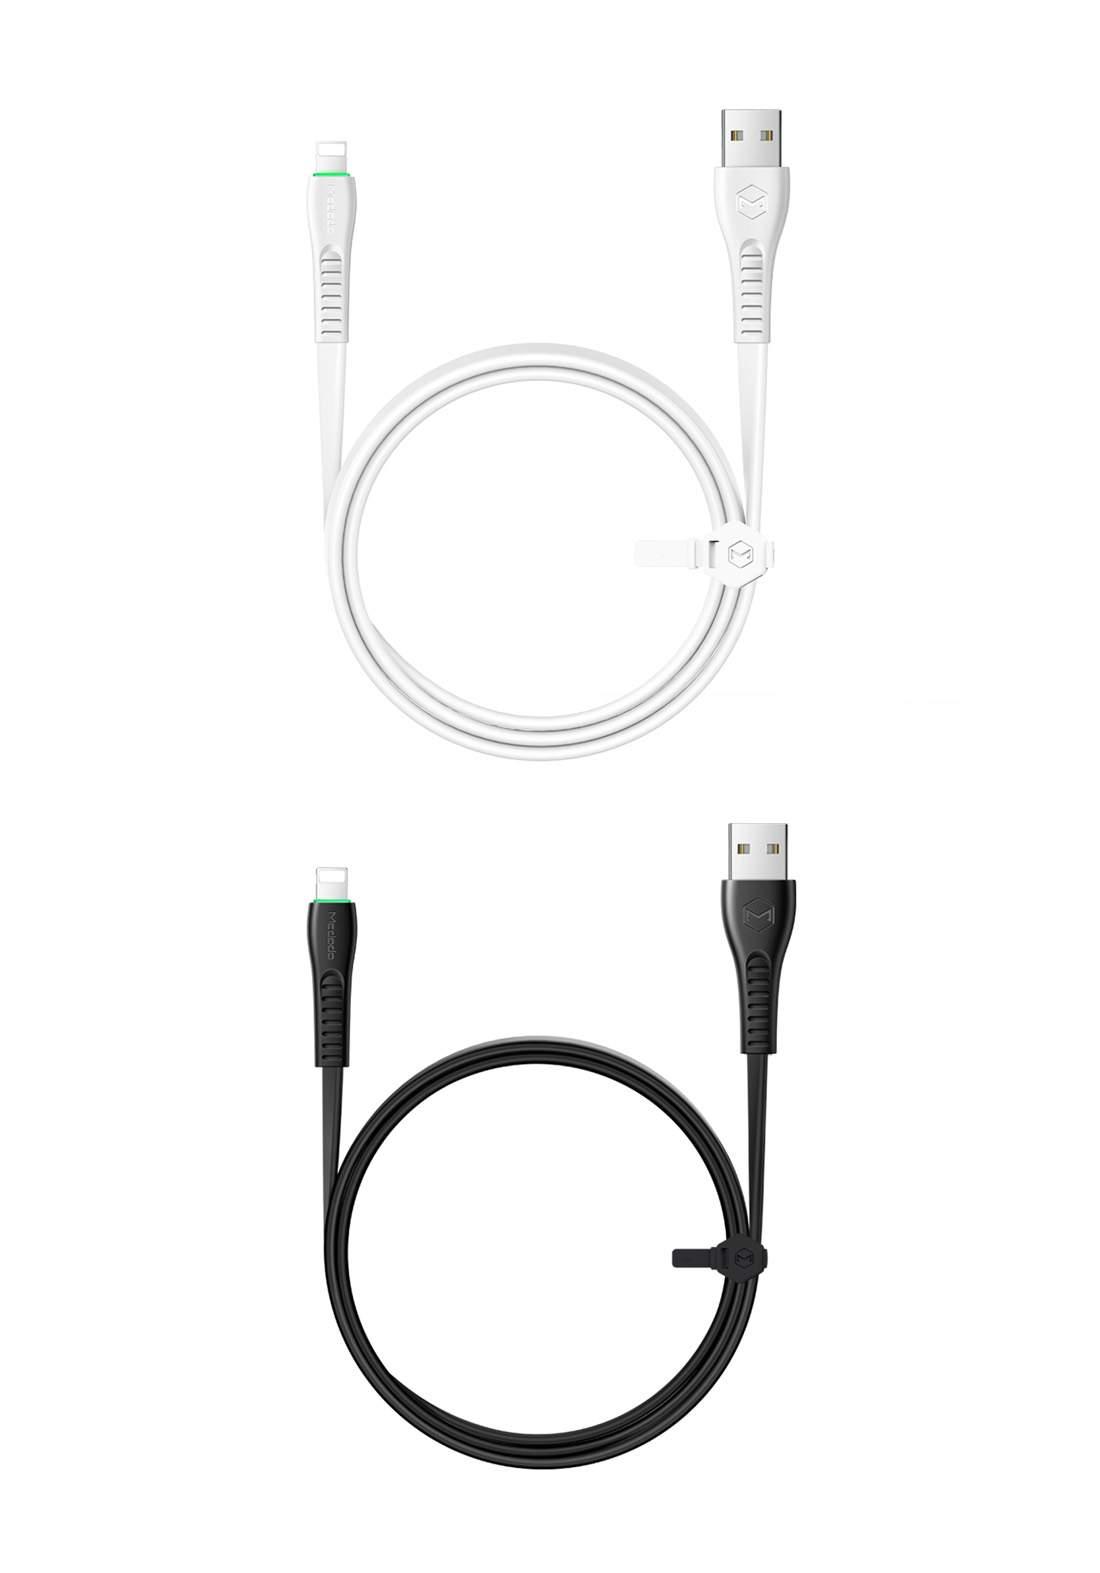 Mcdodo USB to Lightning Cable 1.2m كابل